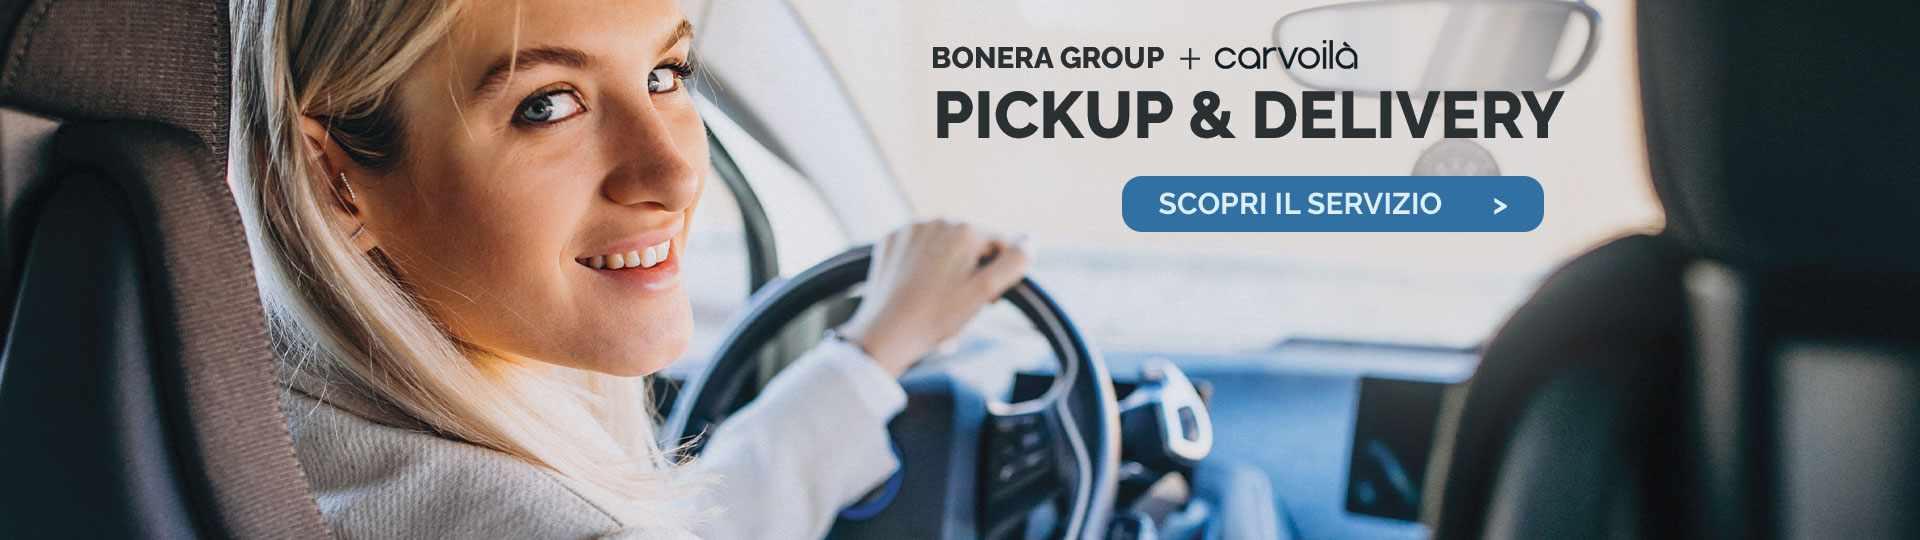 header_pickup_delivery_carvoila_bonera_maggio_2021.jpg